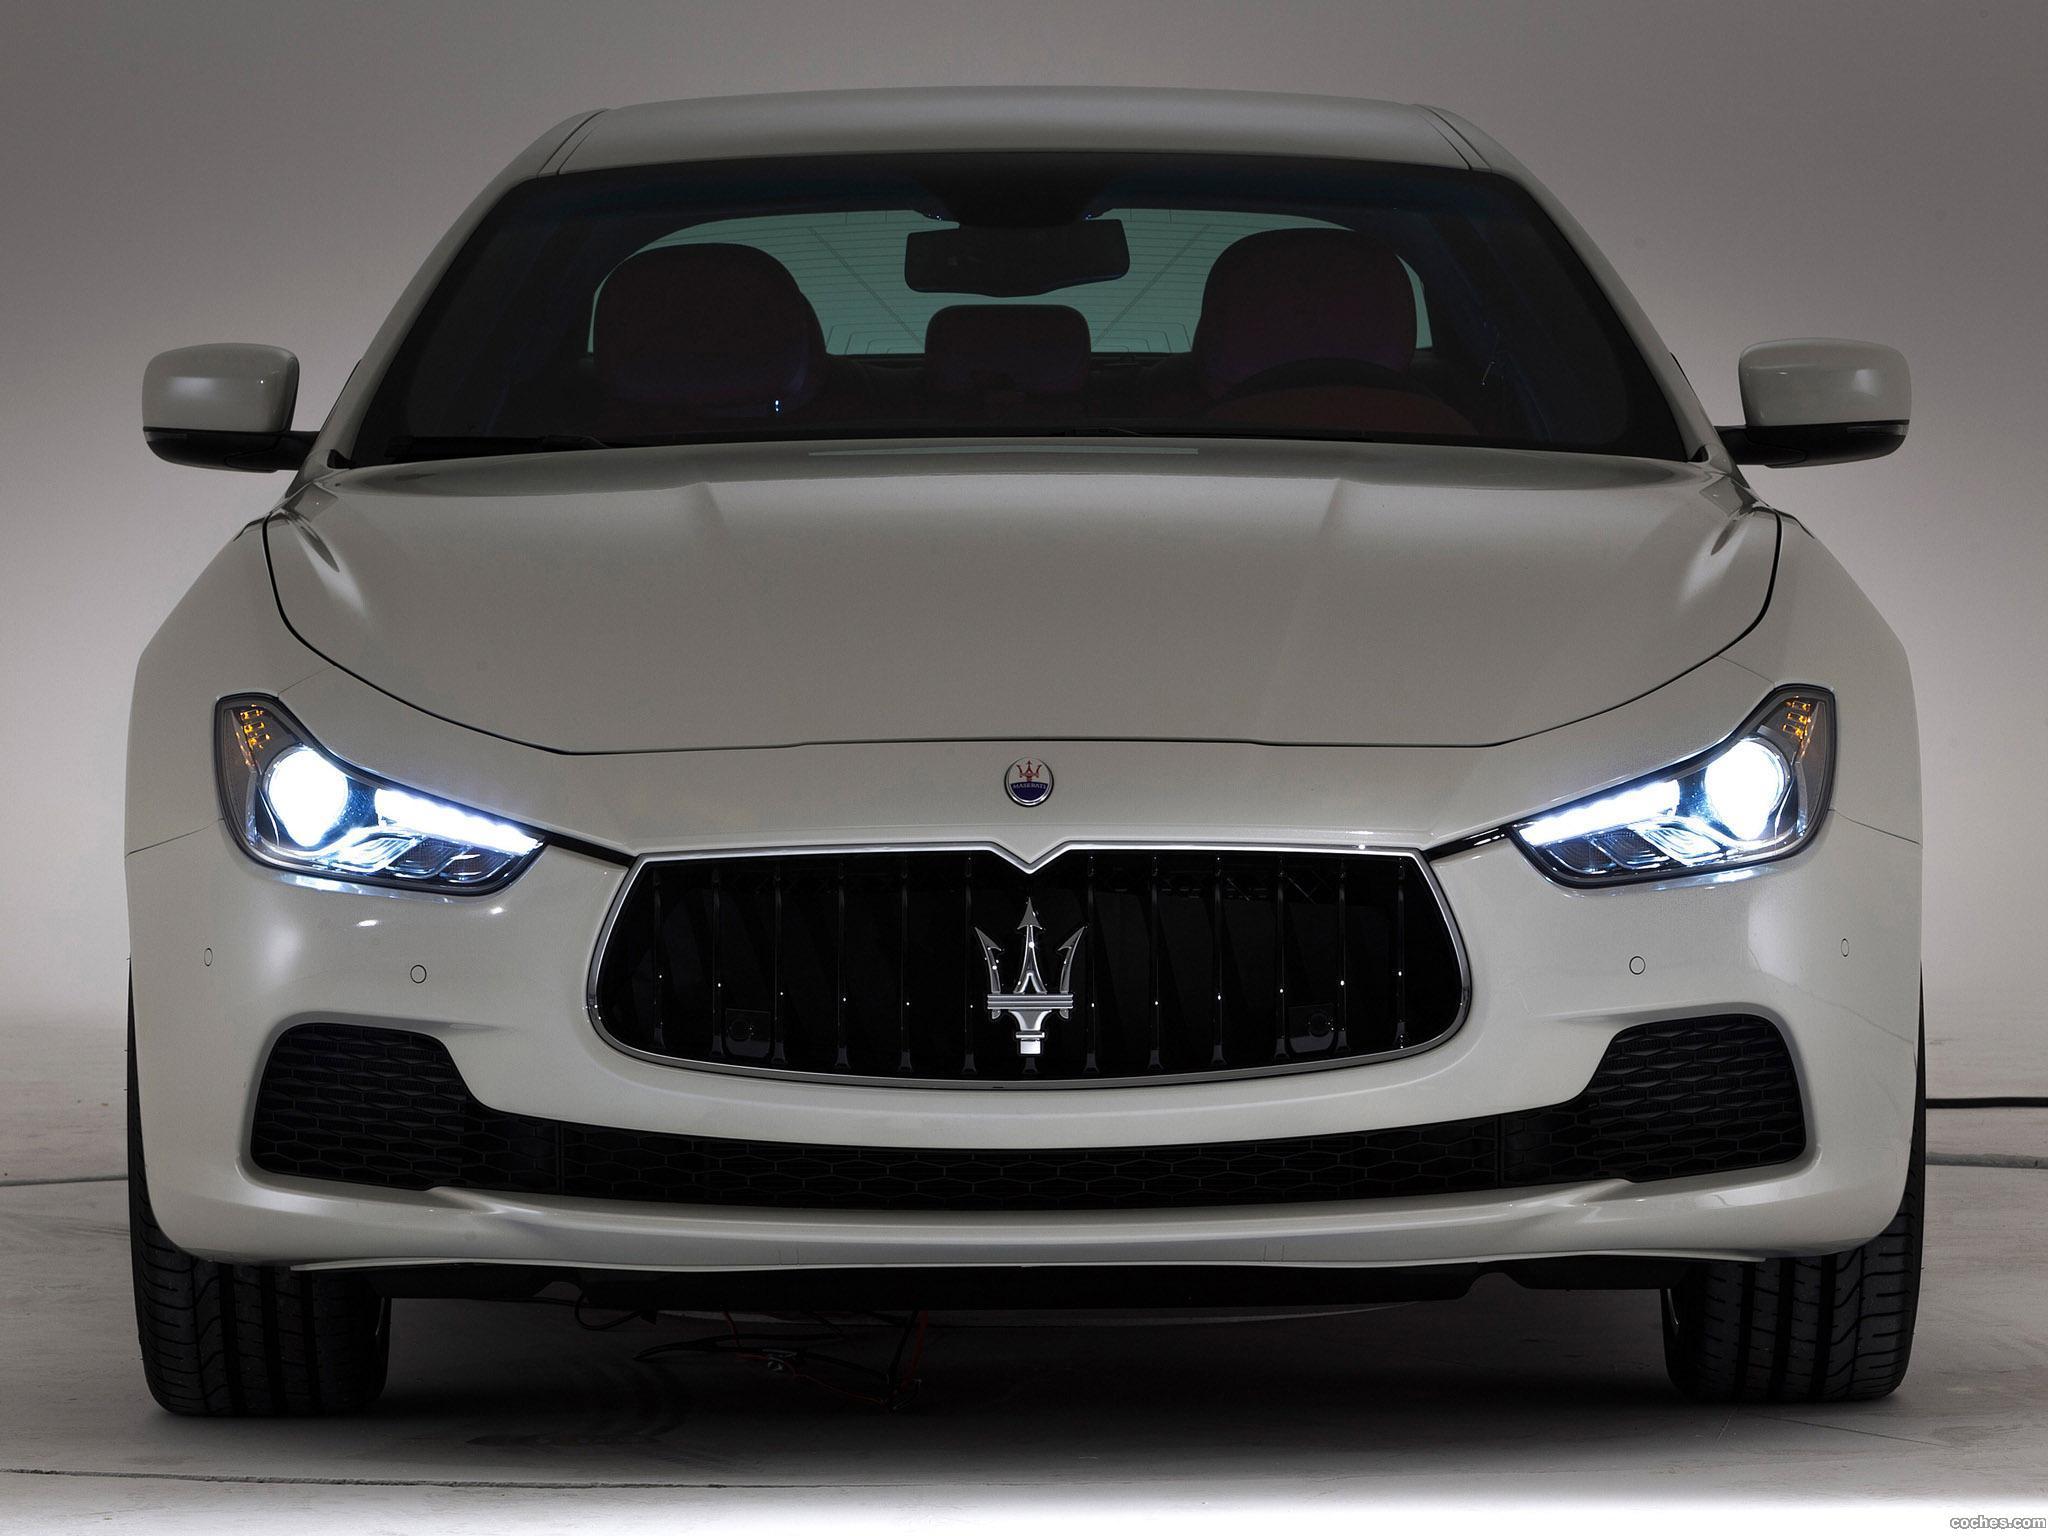 Maserati Ghibli 15 Cool Car Hd Wallpaper